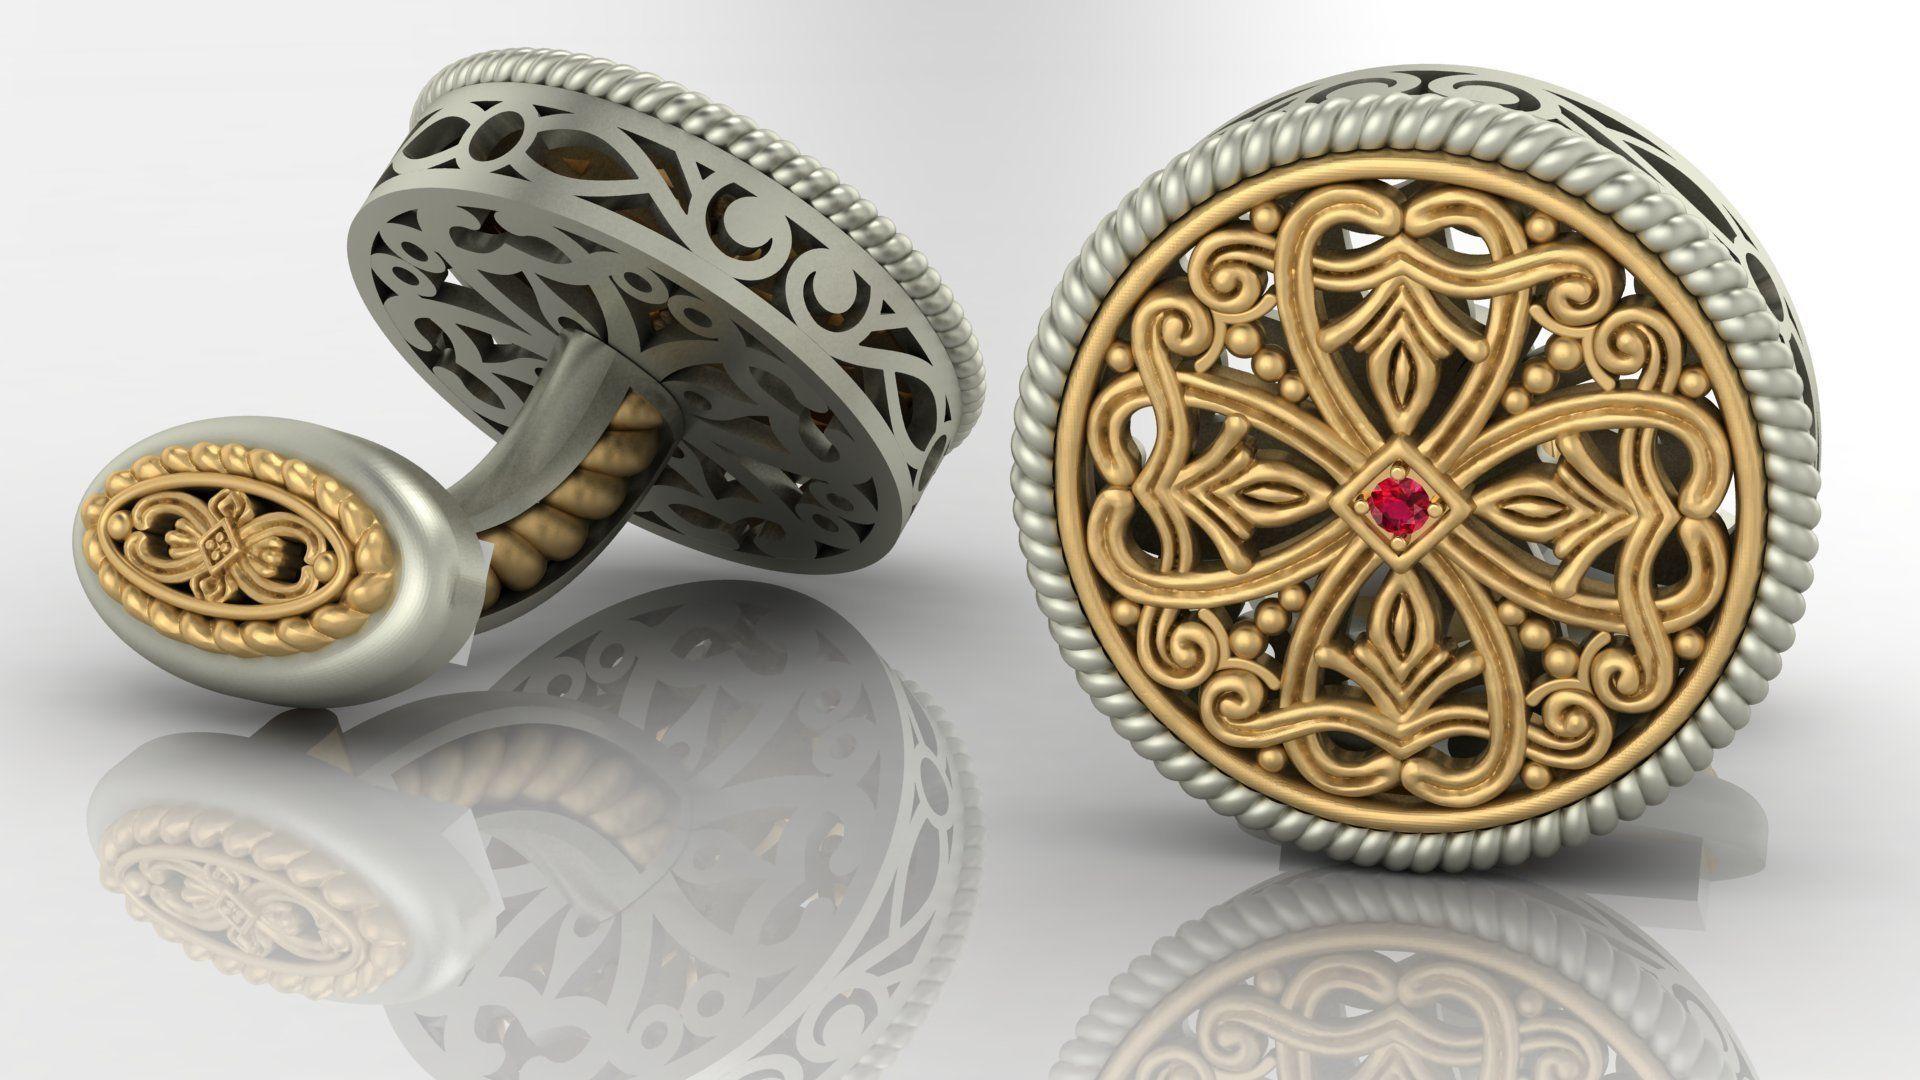 Cufflinks with creative patterns